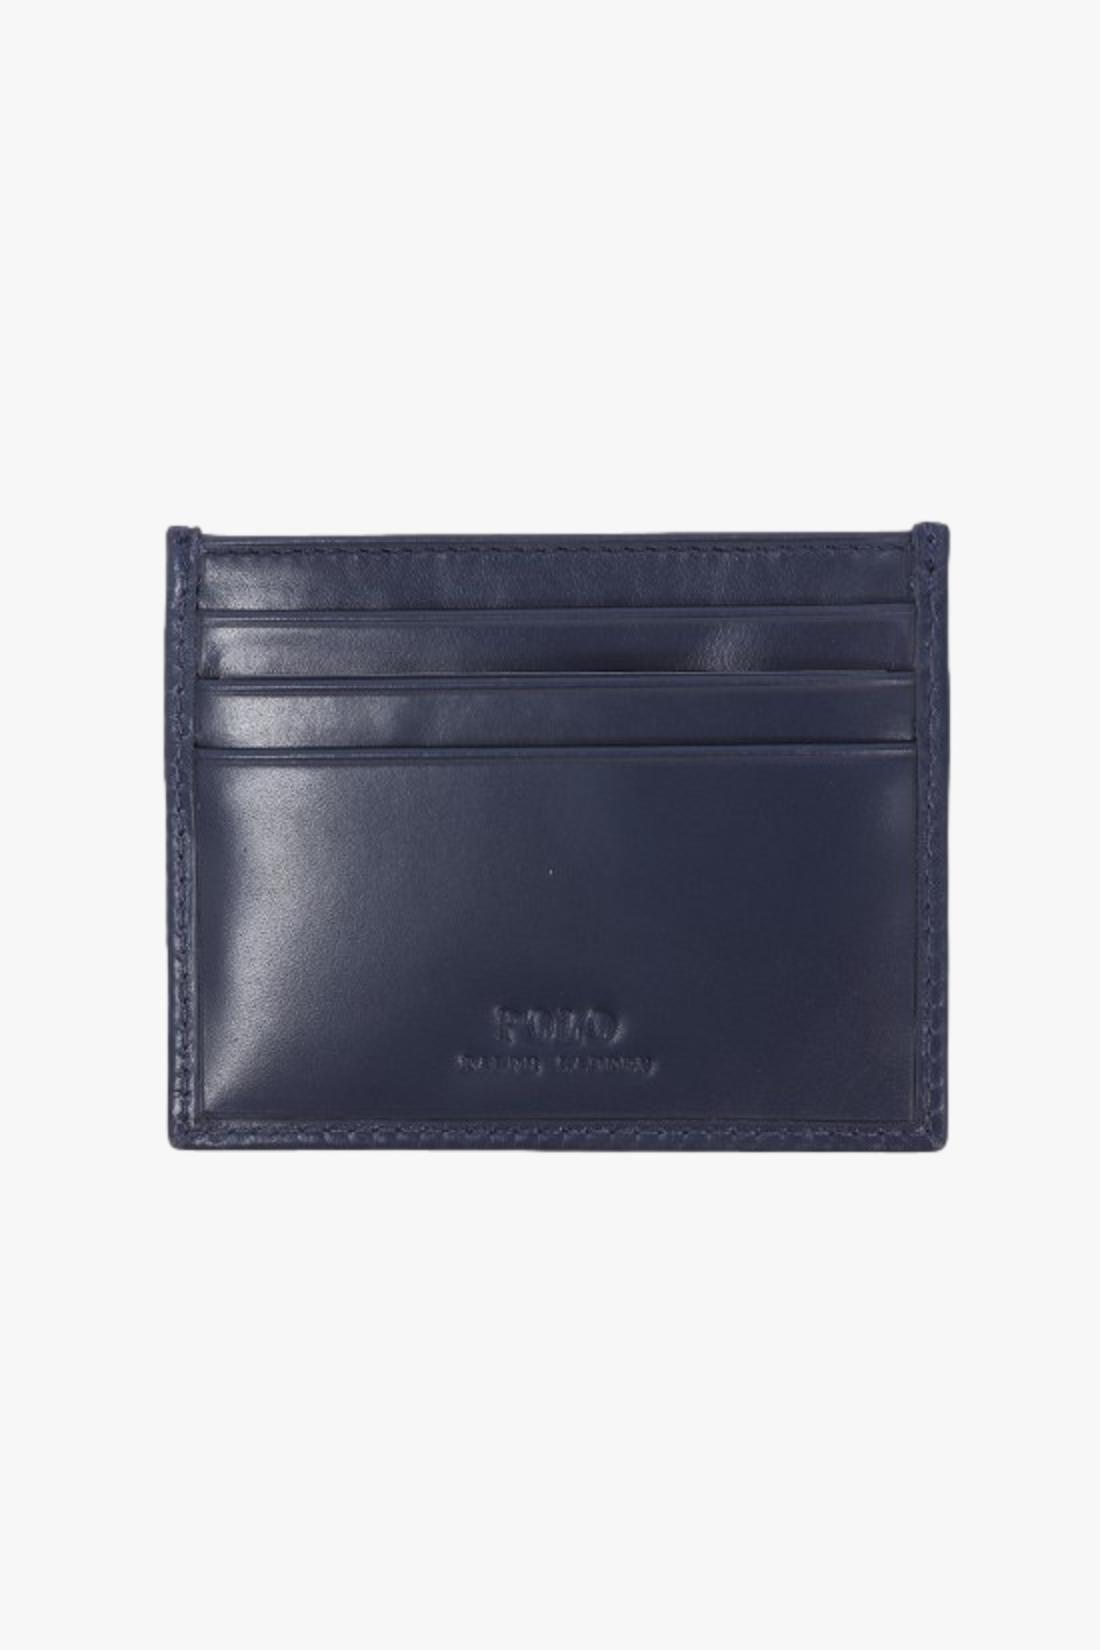 POLO RALPH LAUREN / Polo bear card case leather Navy